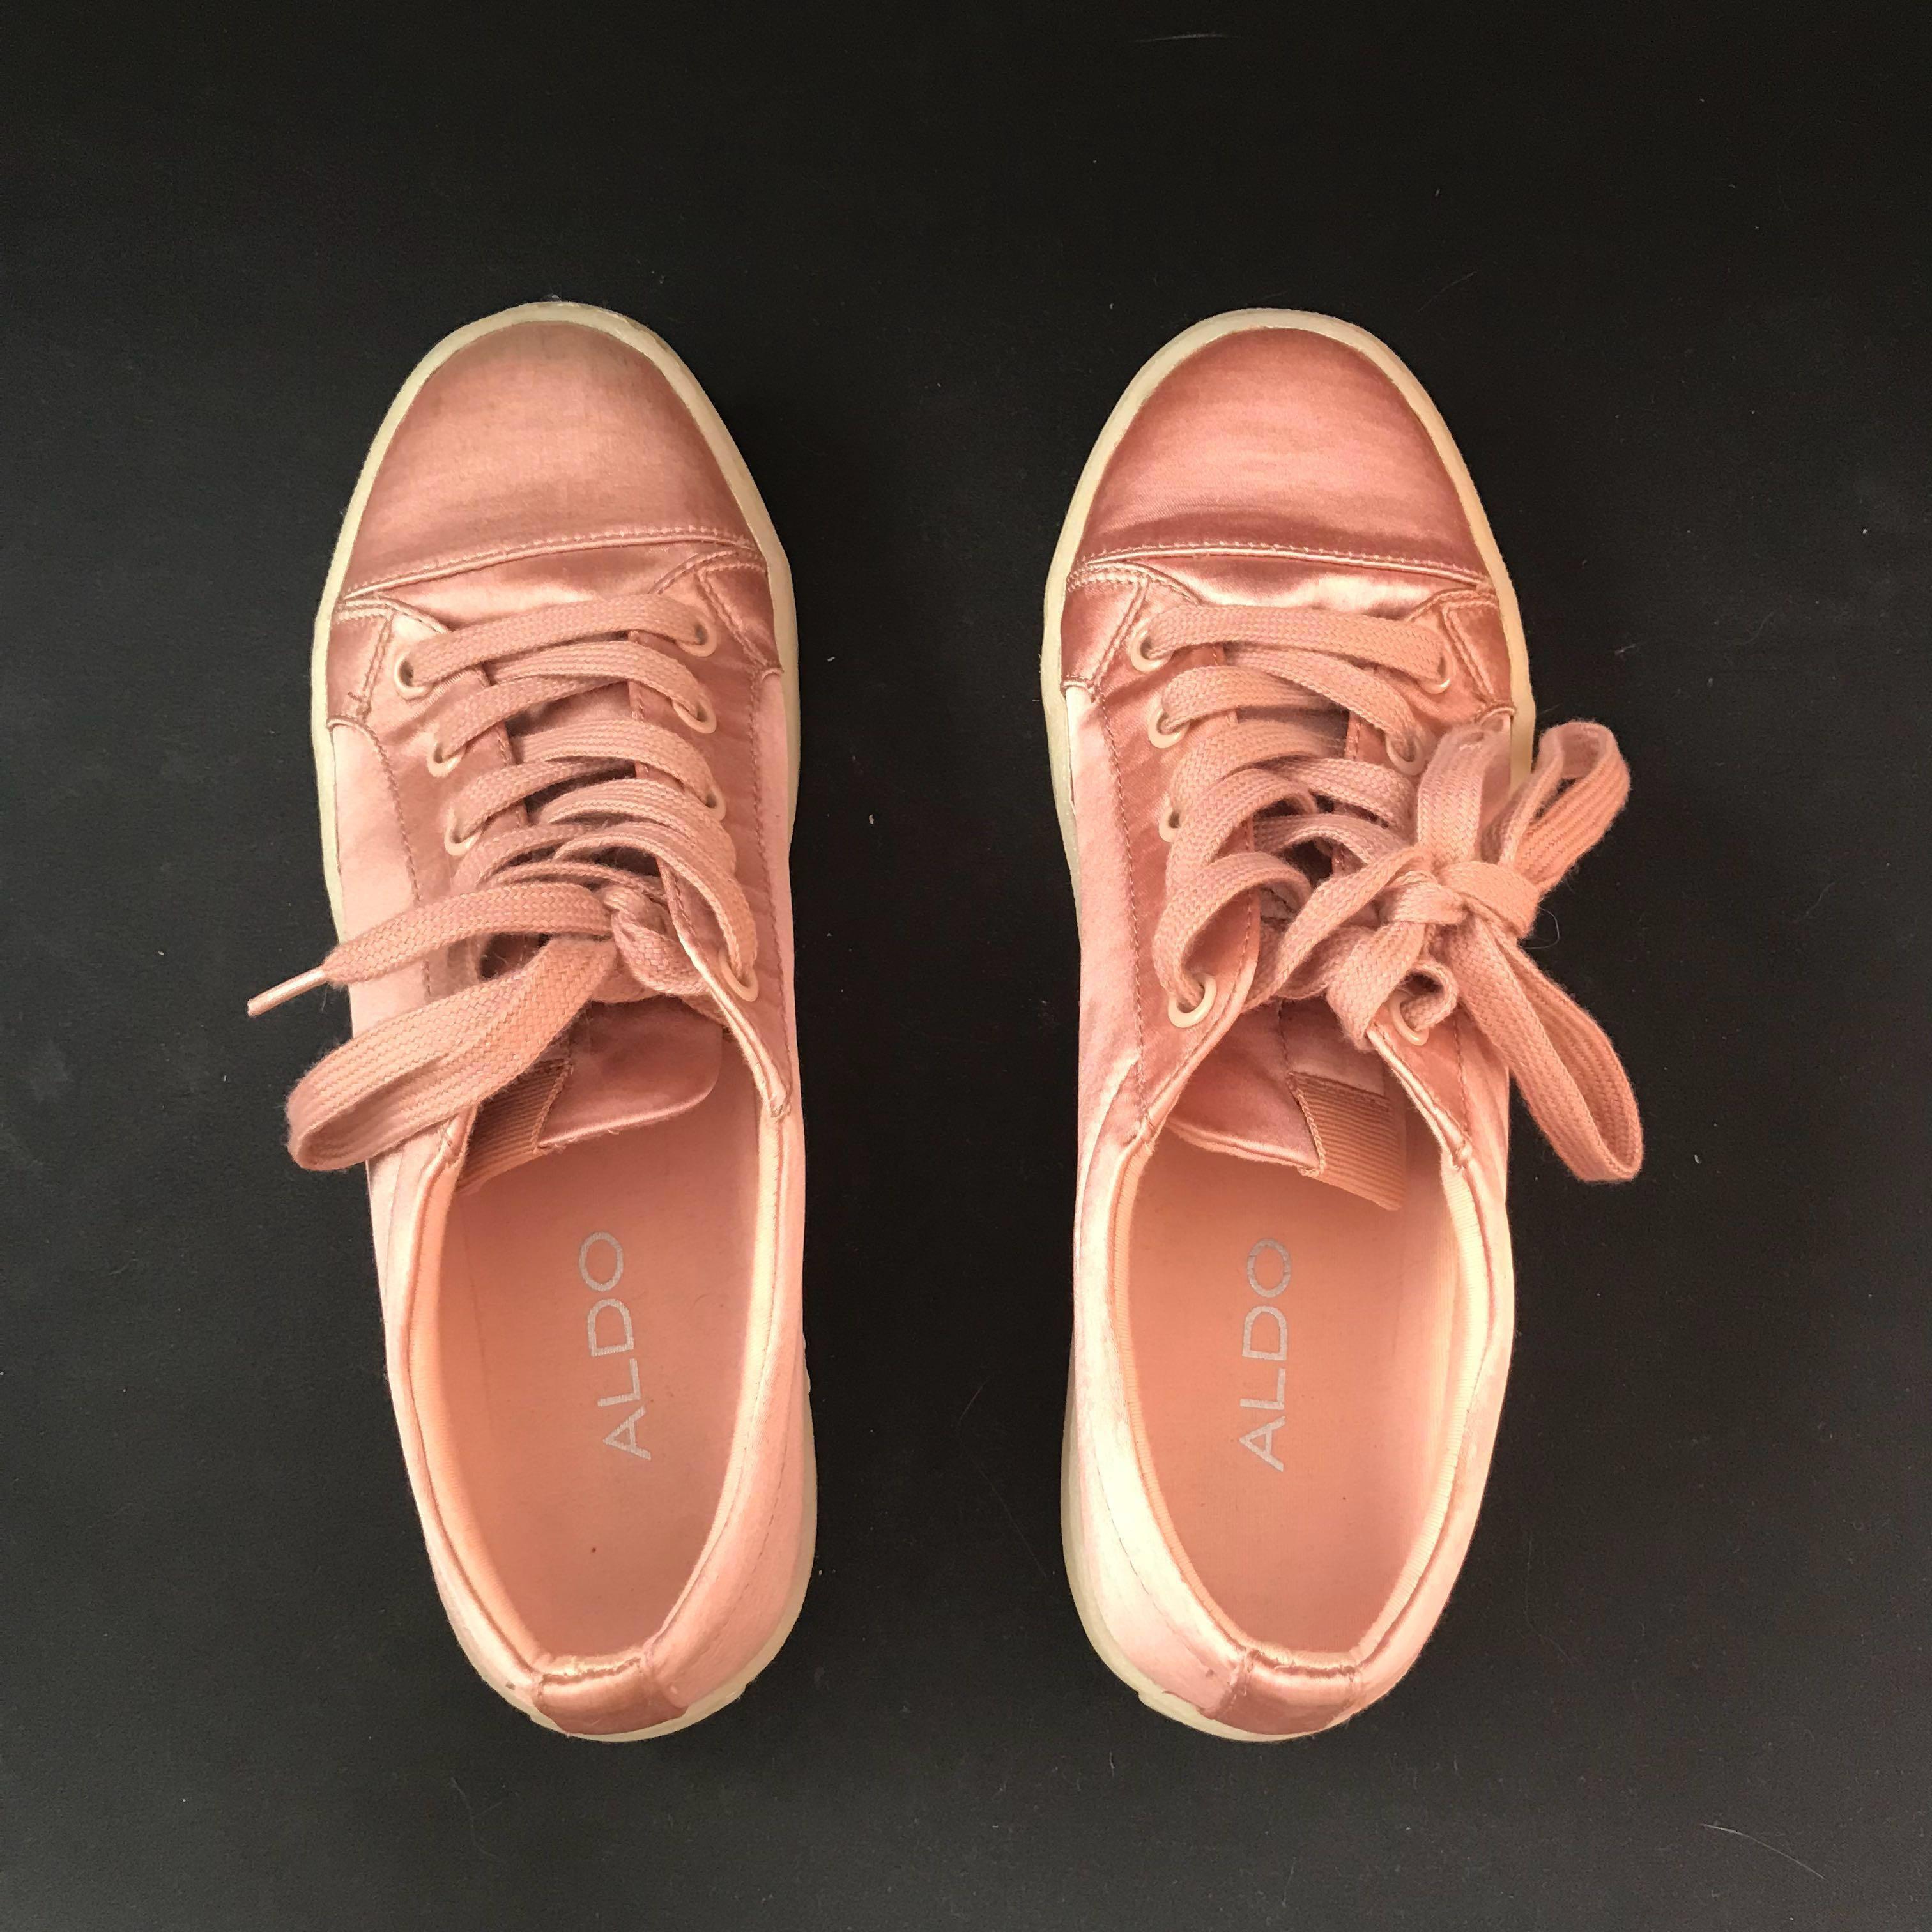 b50d9d02bd34 Home · Women s Fashion · Shoes. photo photo ...